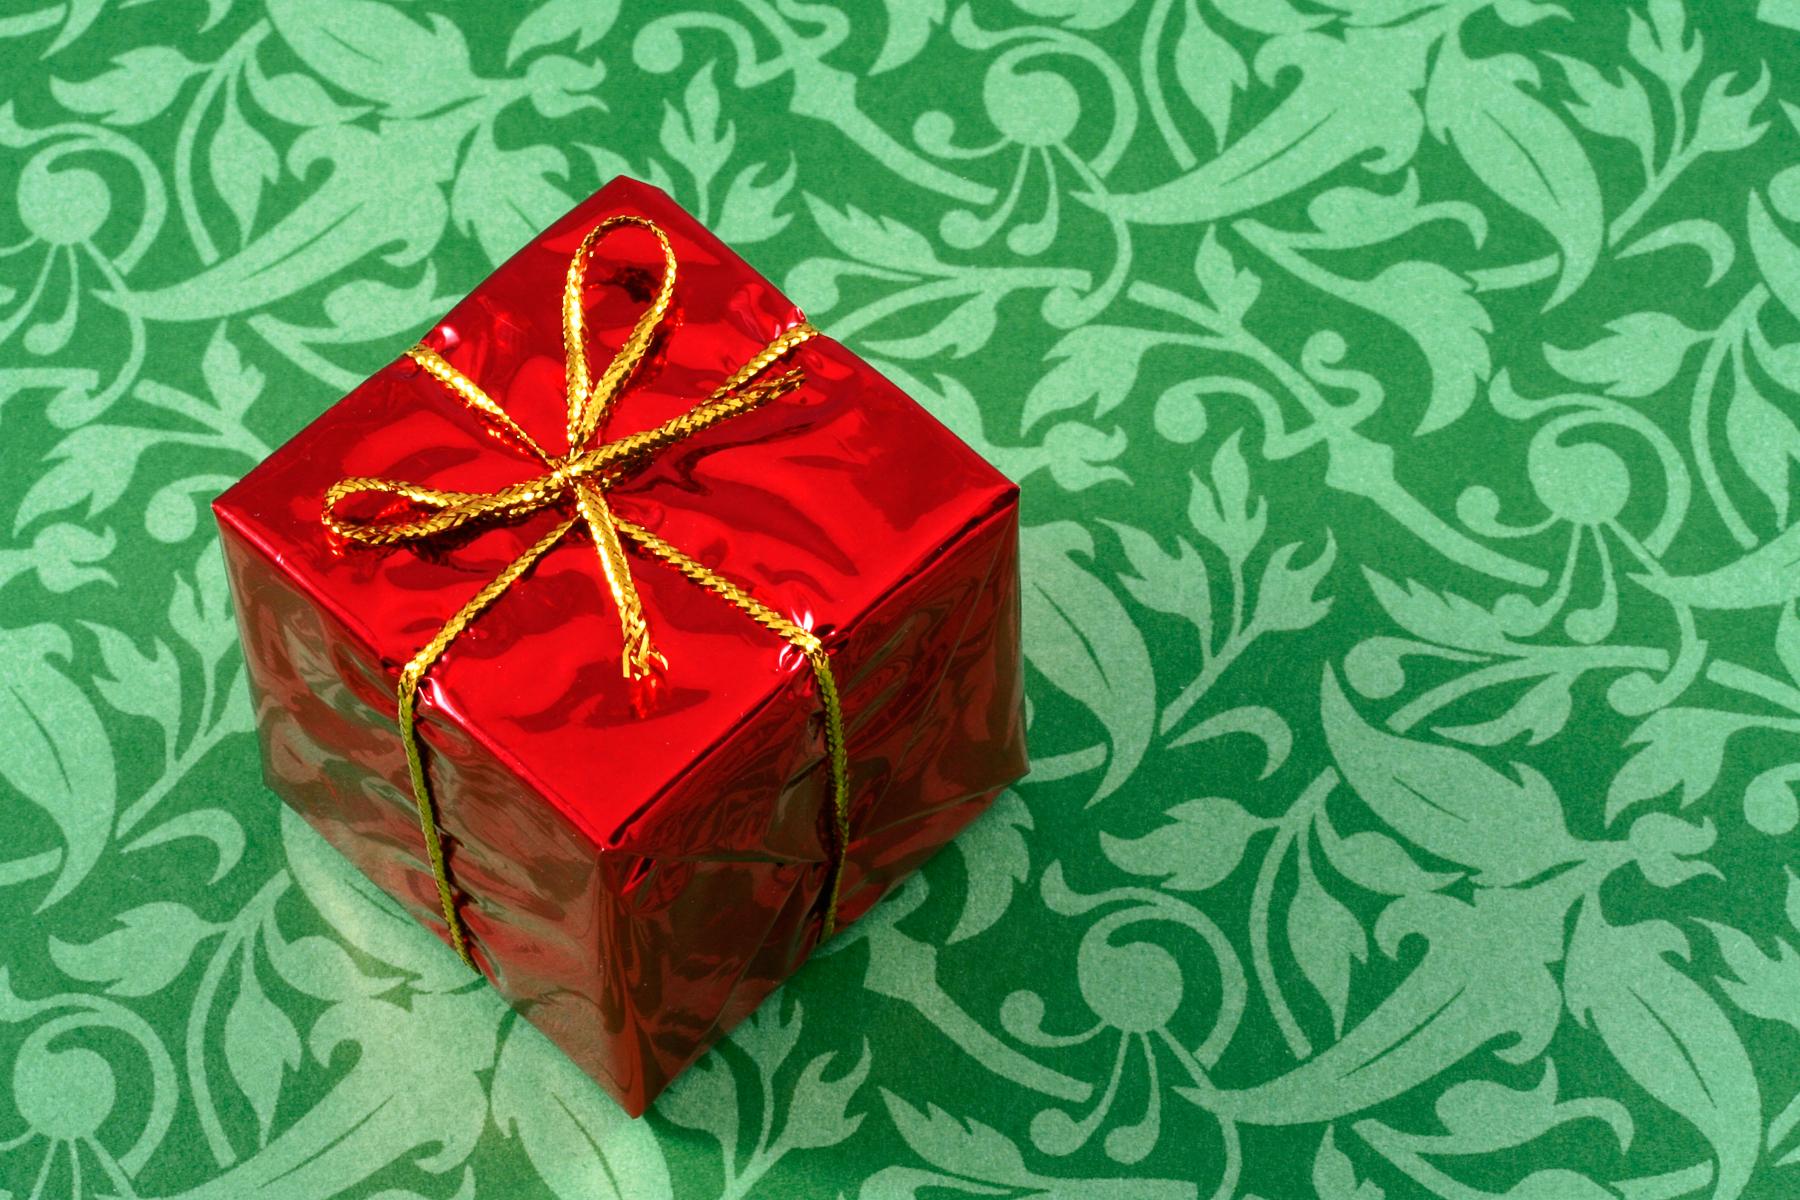 Gift Box Close-up, Bow, Resource, Ornament, Ornamental, HQ Photo